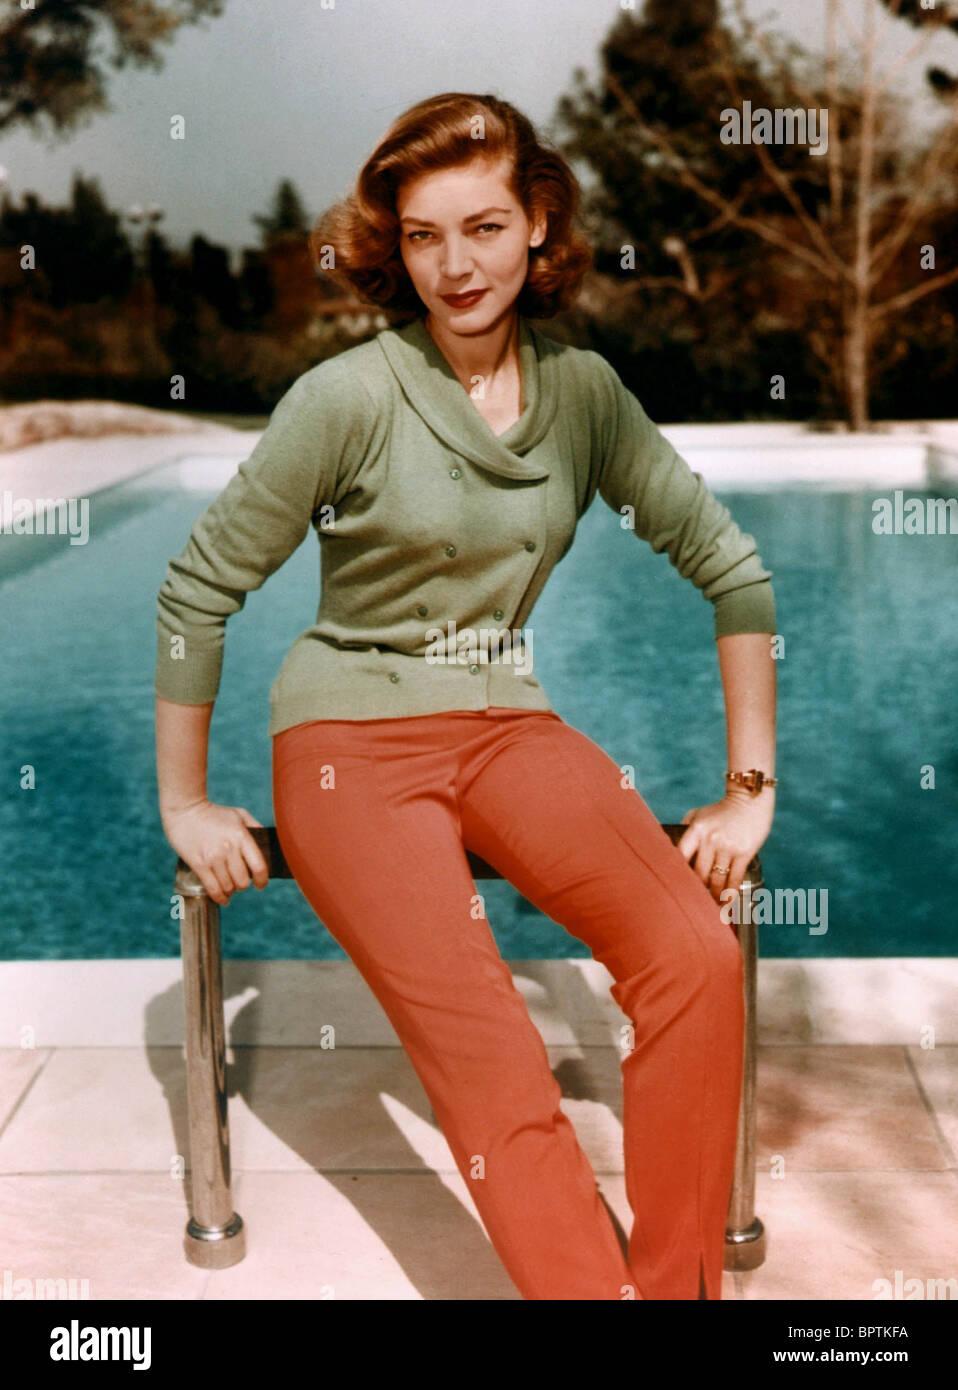 LAUREN BACALL ACTRESS (1950) - Stock Image